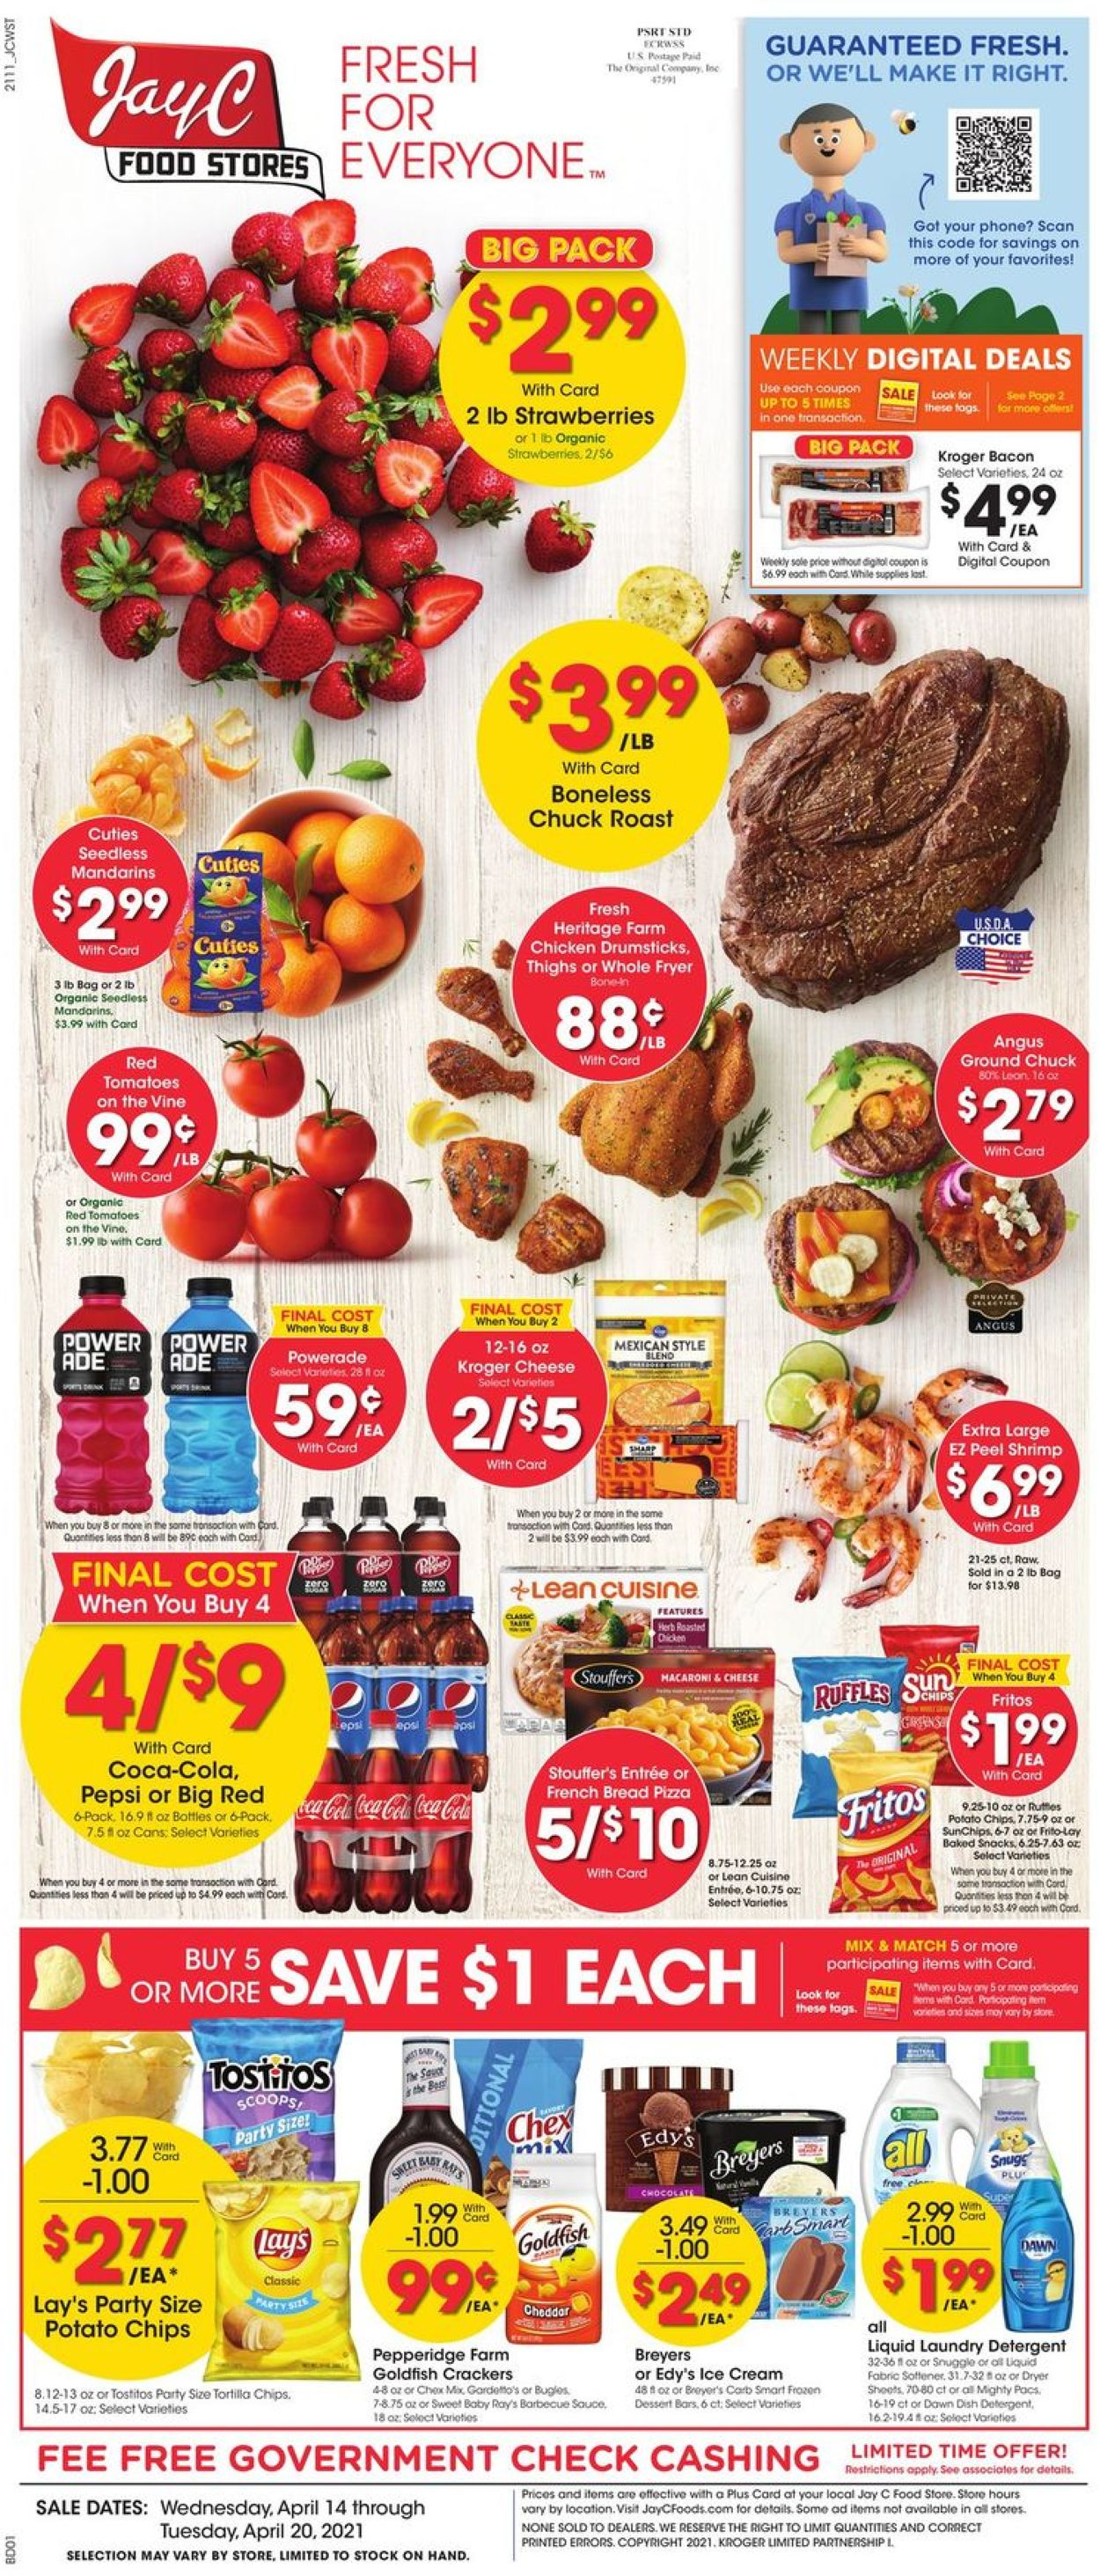 Jay C Food Stores Weekly Ad Circular - valid 04/14-04/20/2021